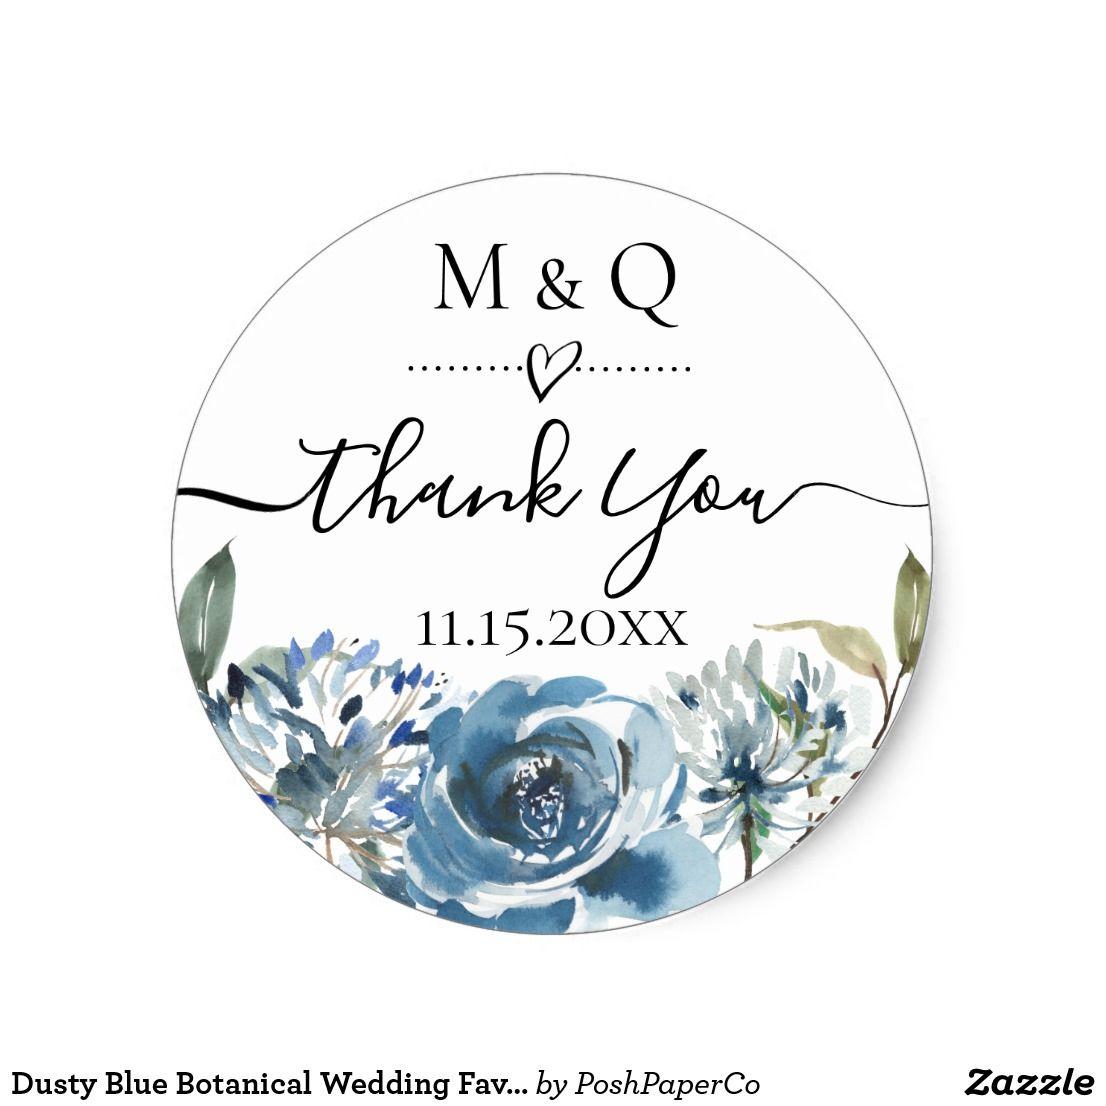 Wedding Sticker Wedding Favor Tags Roses Succulent Wedding Sticker Wedding Favors Printed on STICKERS OR CARDSTOCK